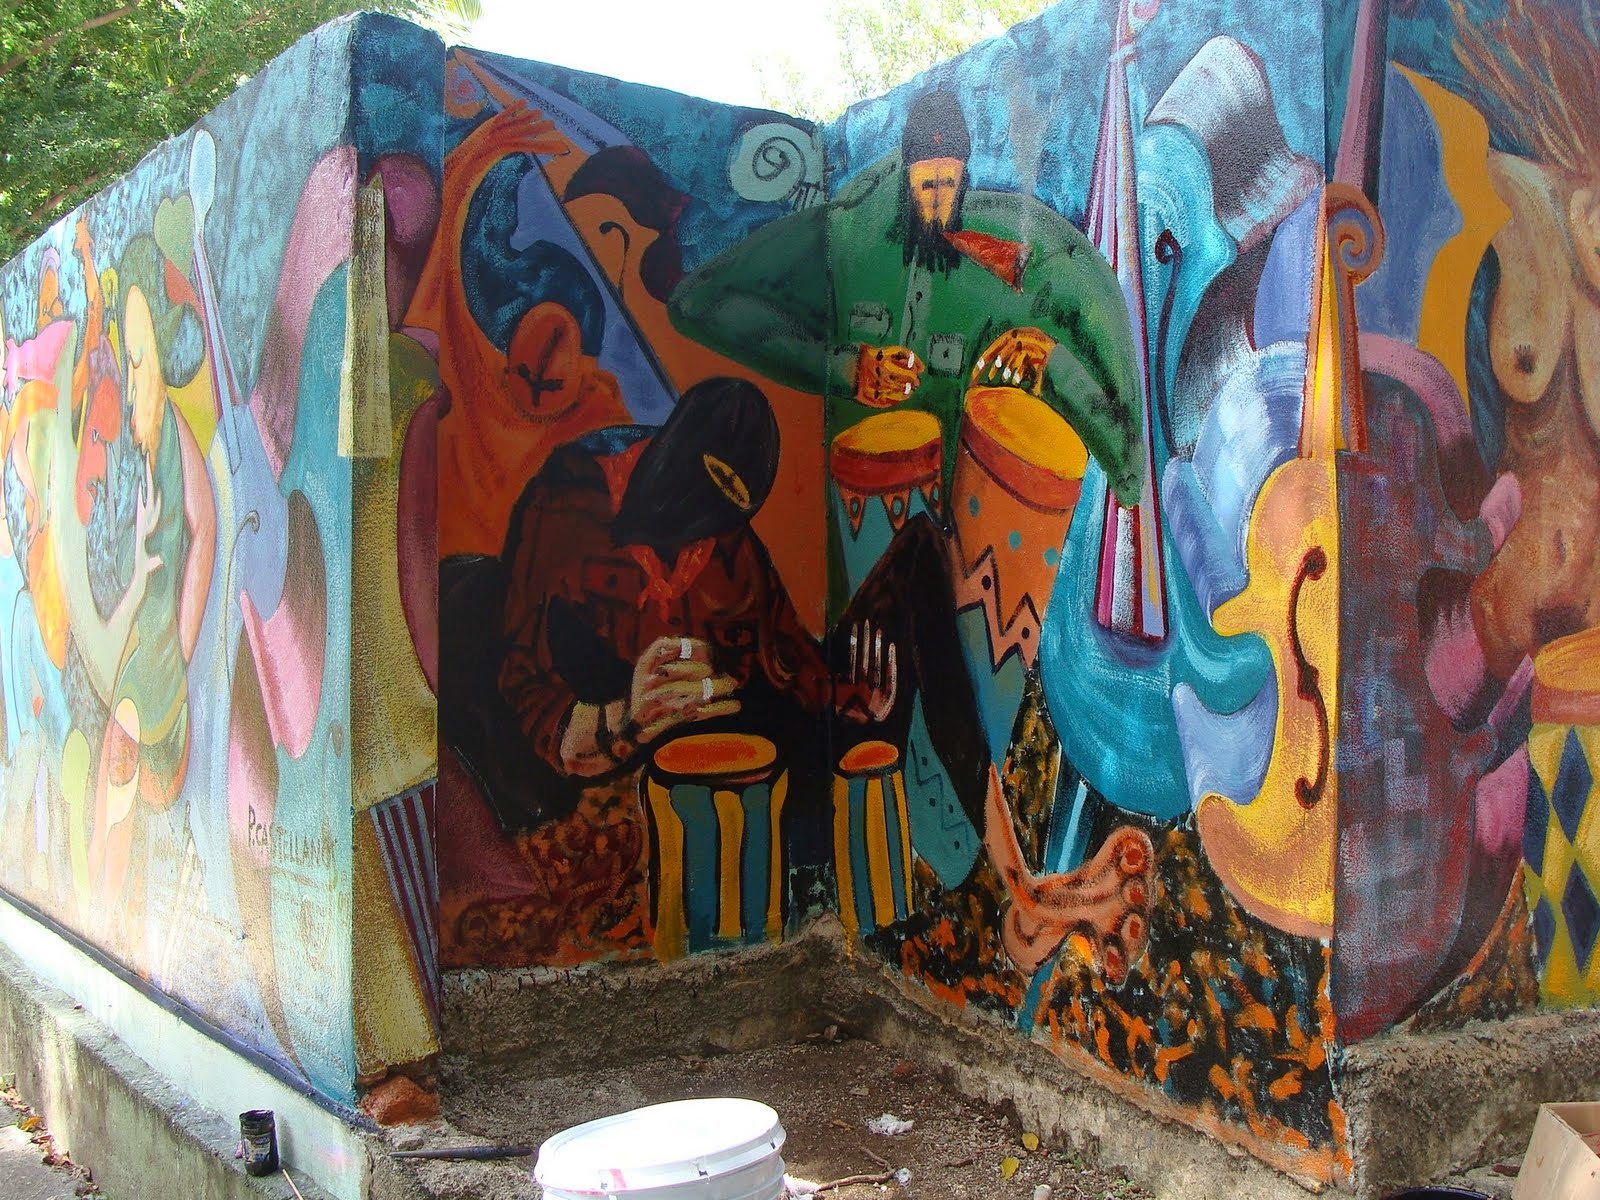 El artista mexicano abel ram rez pinta en cuba un mural for Arte mural mexicano